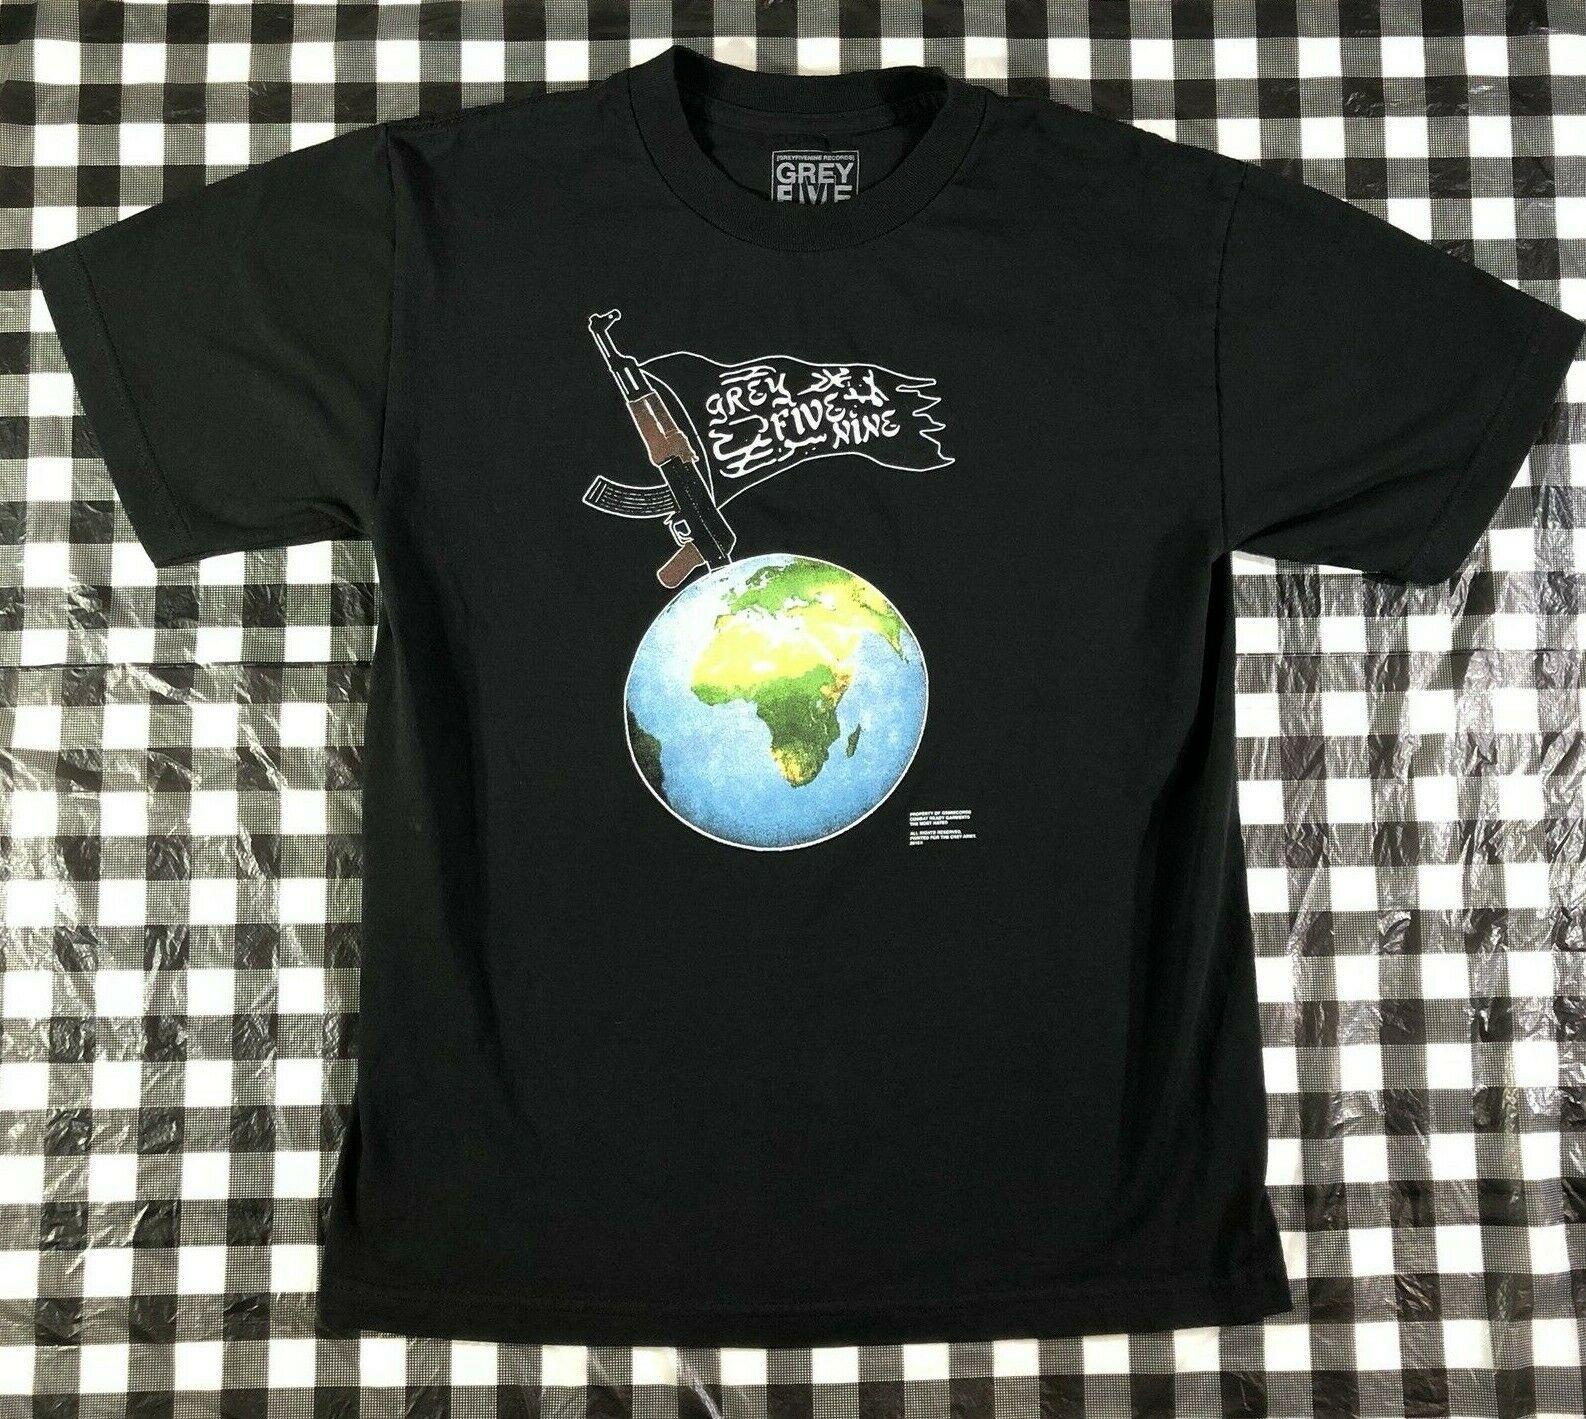 G59 Suicideboys Ak47 Arabic Flag World Black T Shirt Size M Short Sleeves Tee